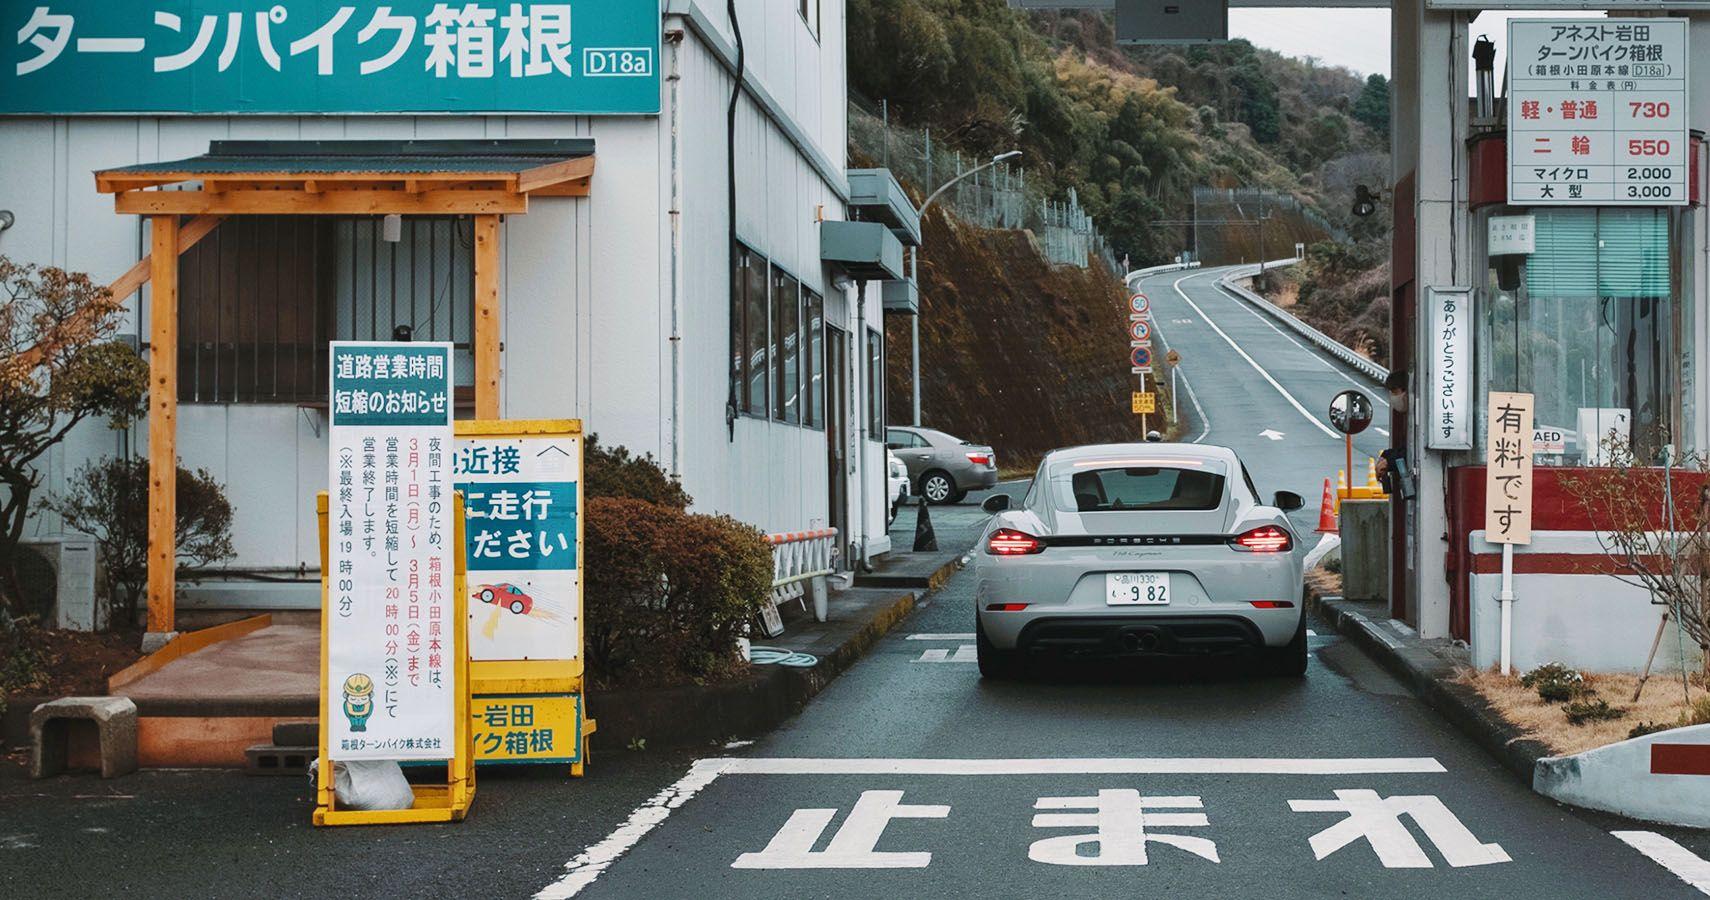 Tokyo Drift In A Cayman? Porsche Celebrates Japan's Iconic Hakone Turnpike